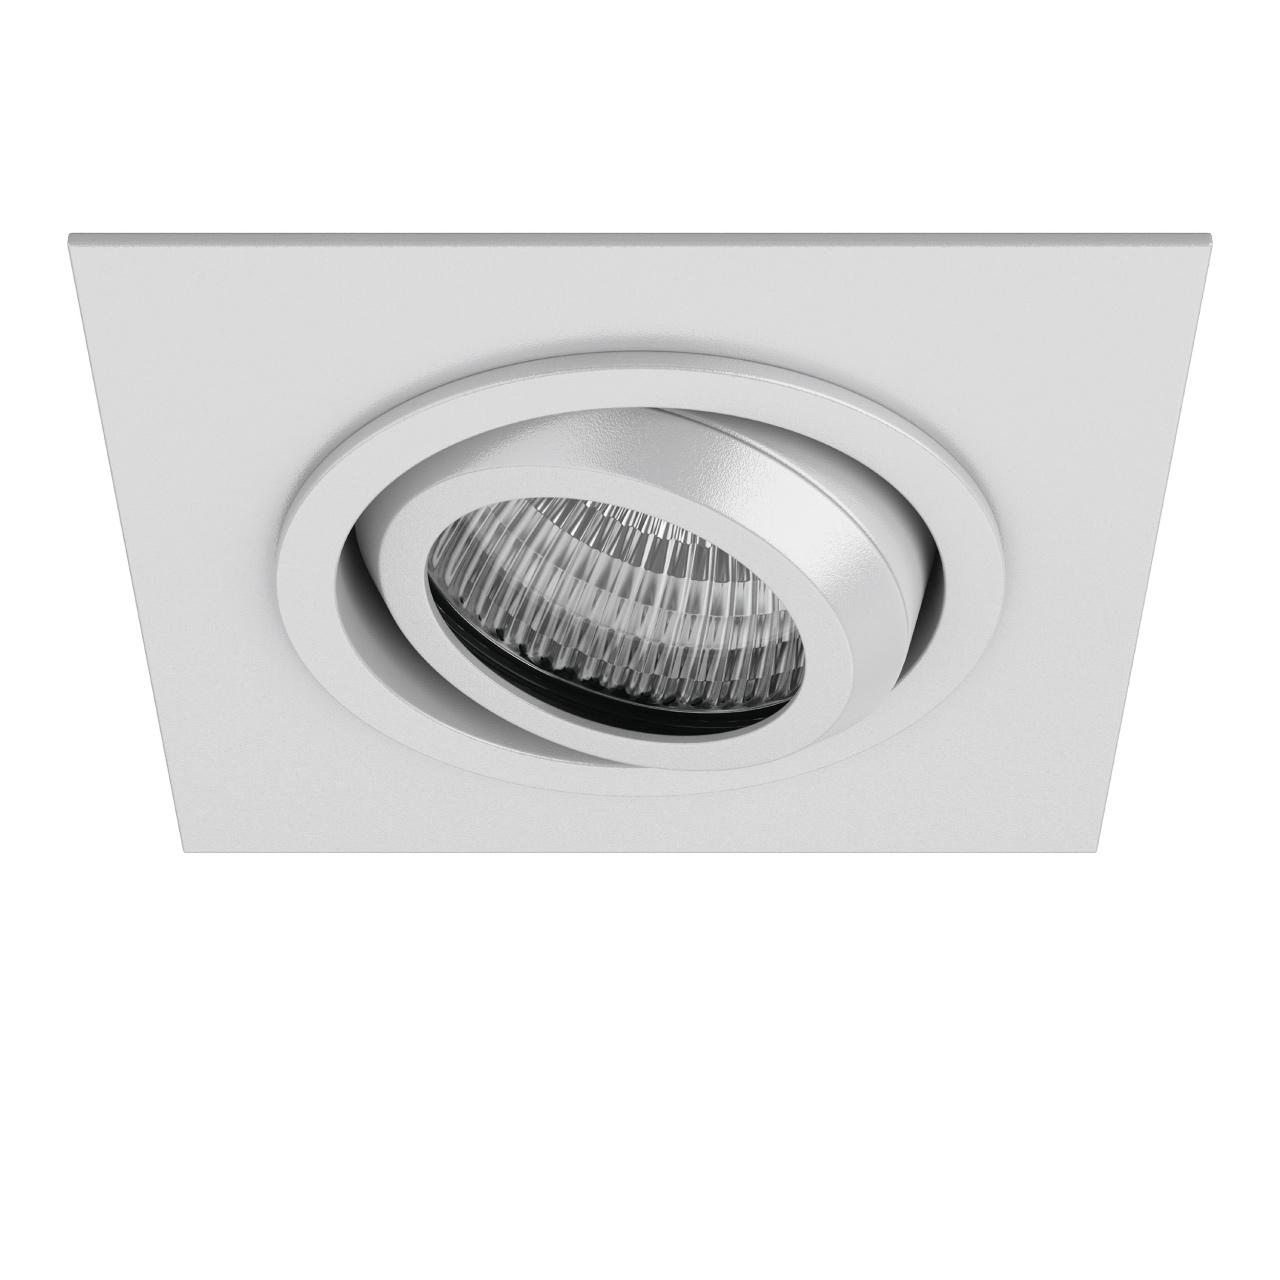 Светильник Singo X1 MR16 / HP16 белый Lightstar 011611